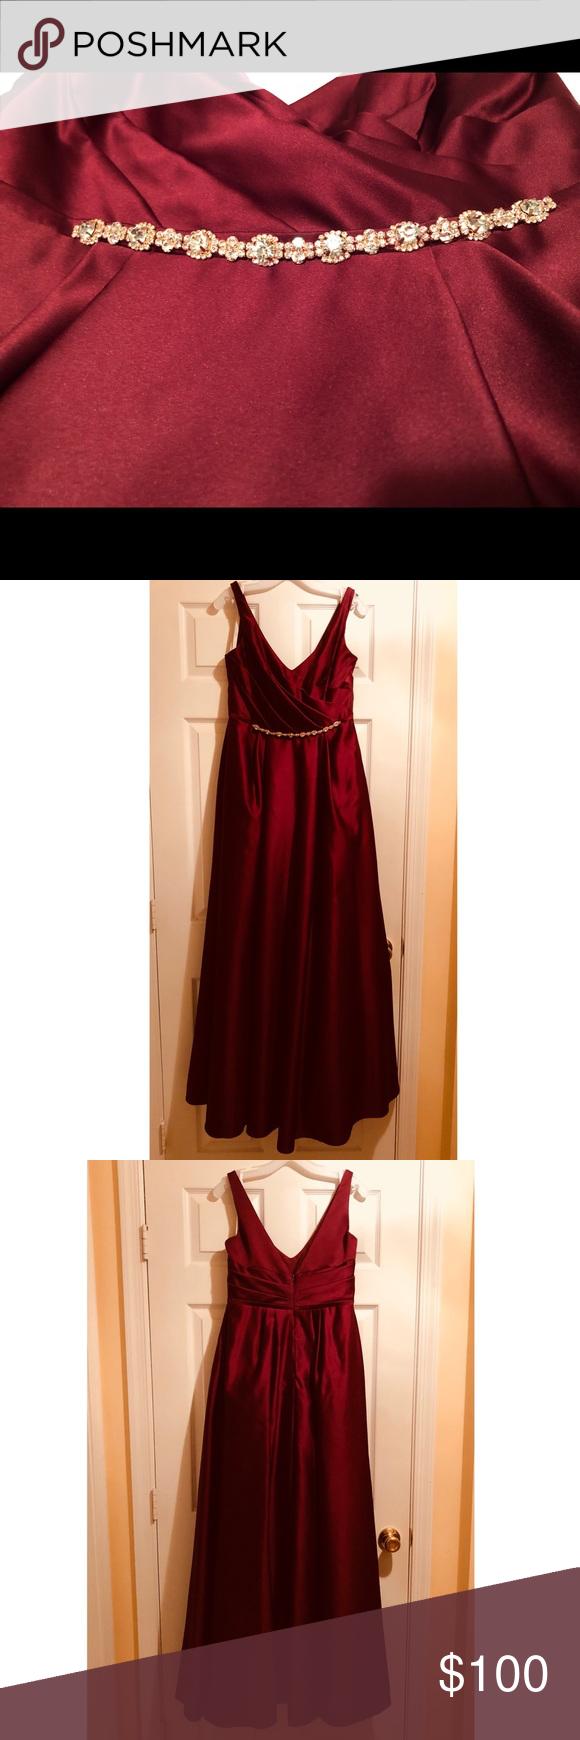 Ballroom gown bridesmaid dress ballroom gowns wine dress and